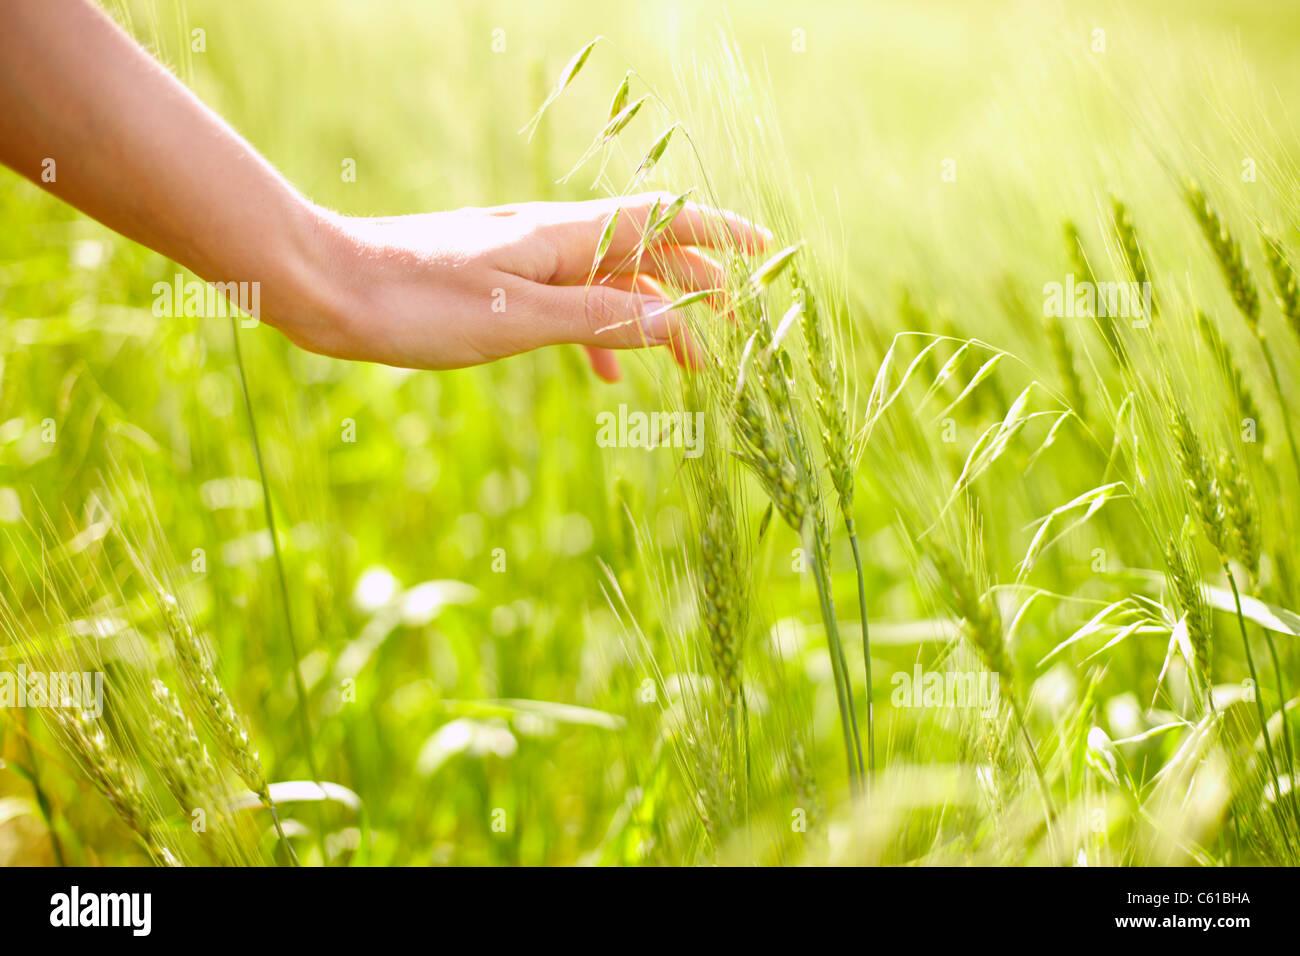 Horizontal image of human hand touching green wheat ears on field - Stock Image